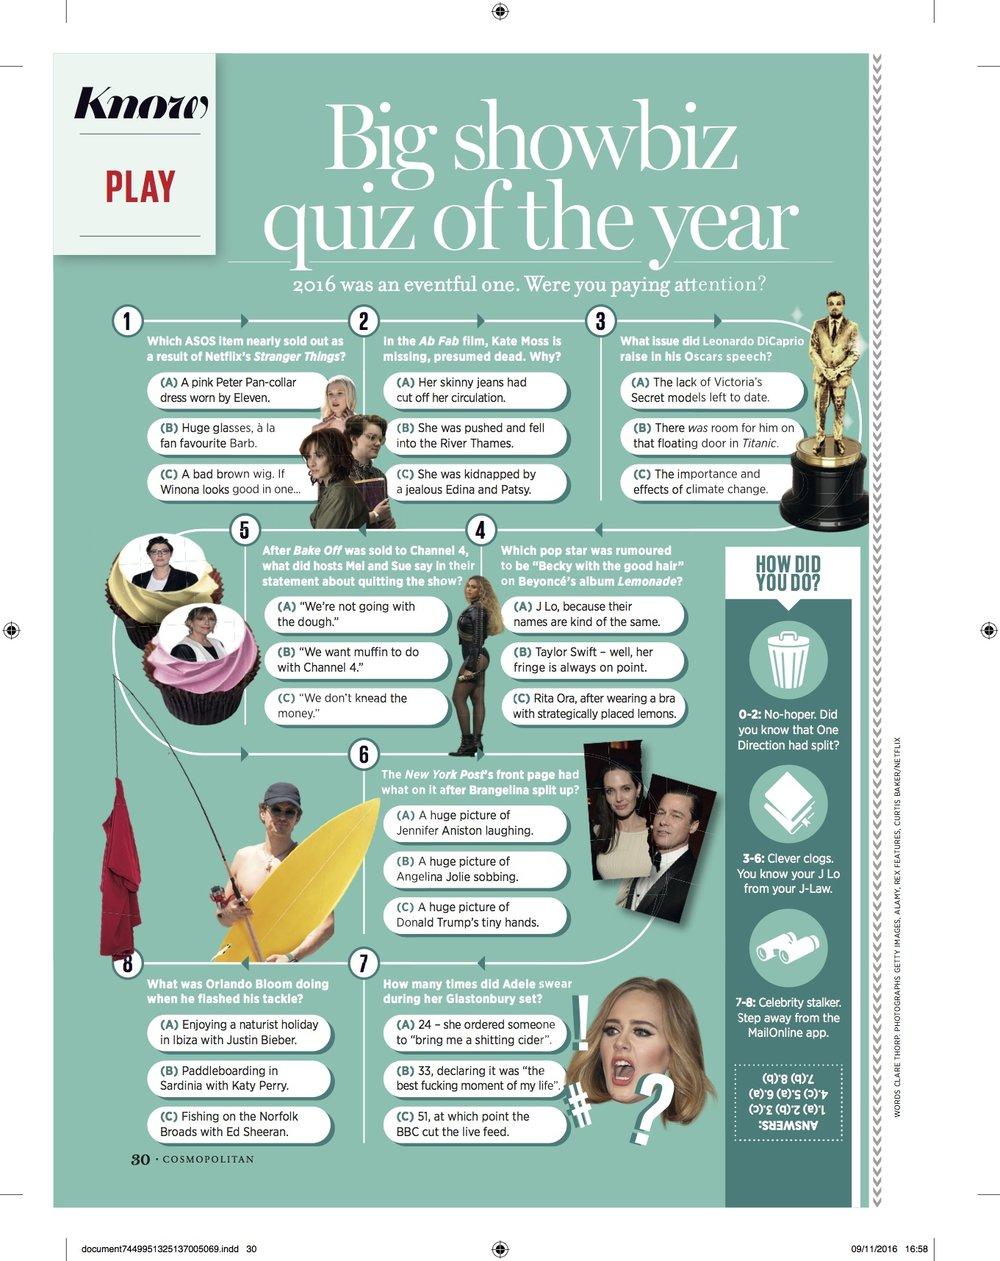 Cosmopolitan 2016 quiz.jpg